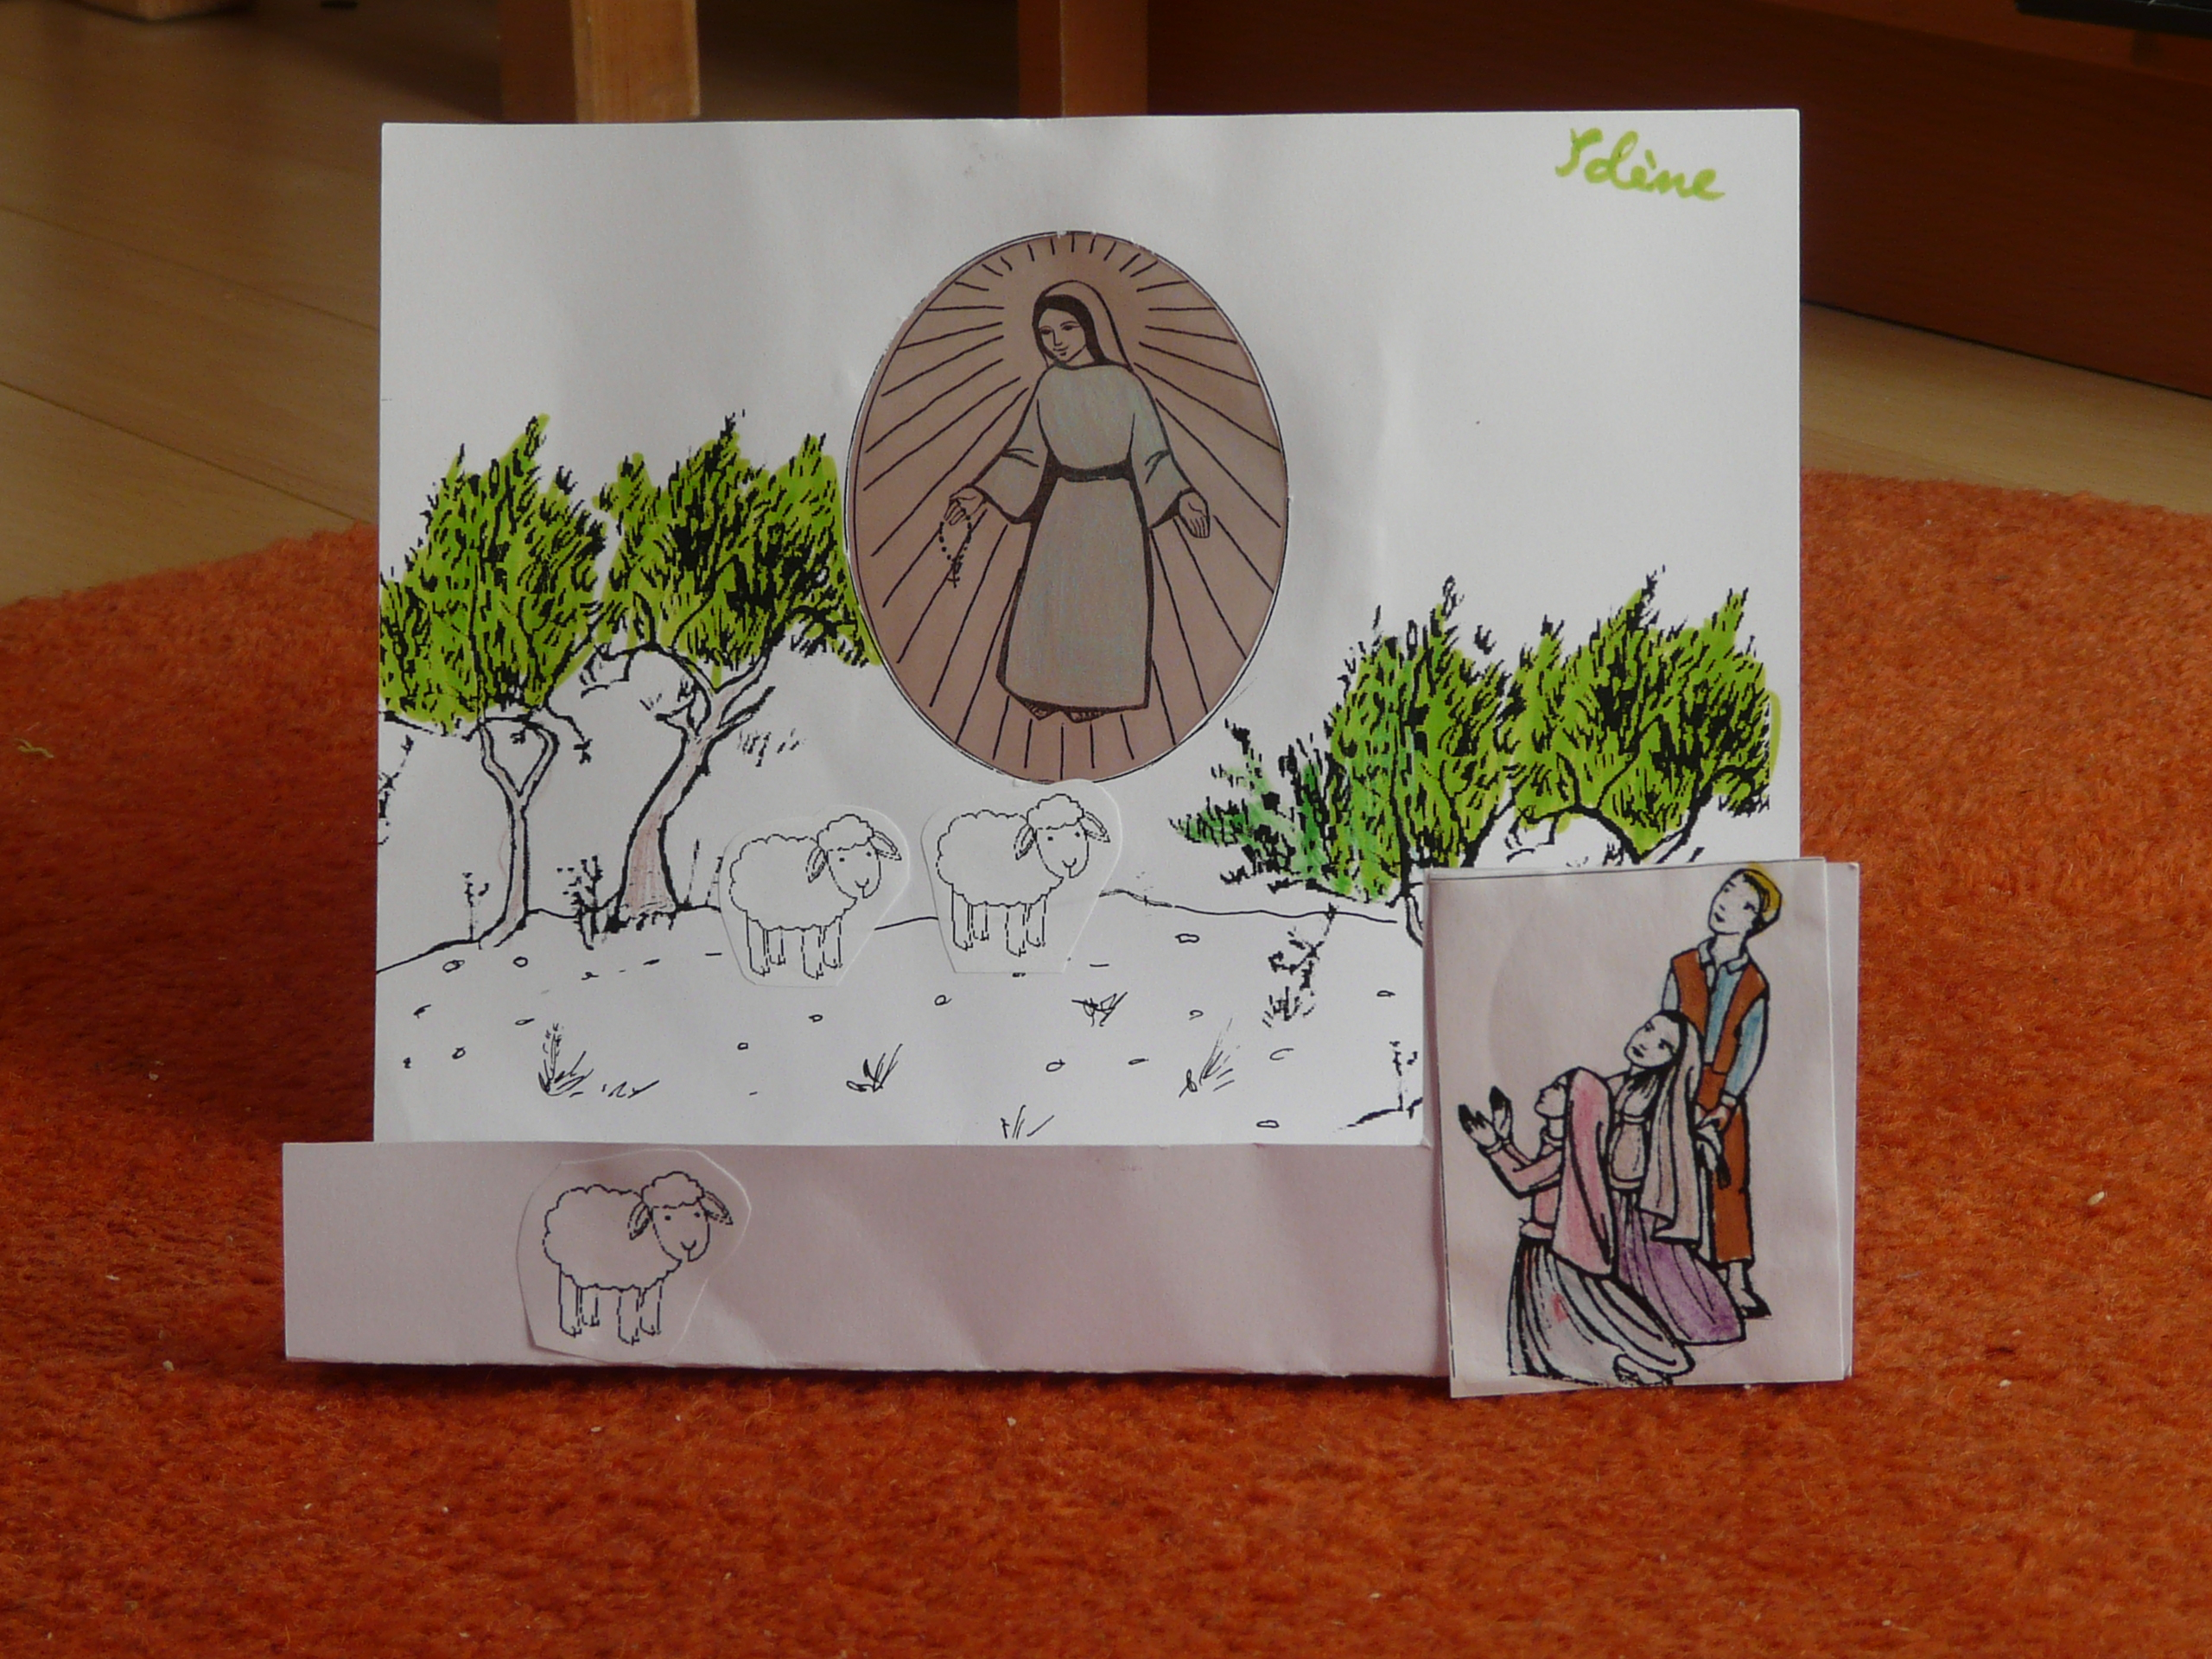 Montage scène apparition de Marie à Fatima